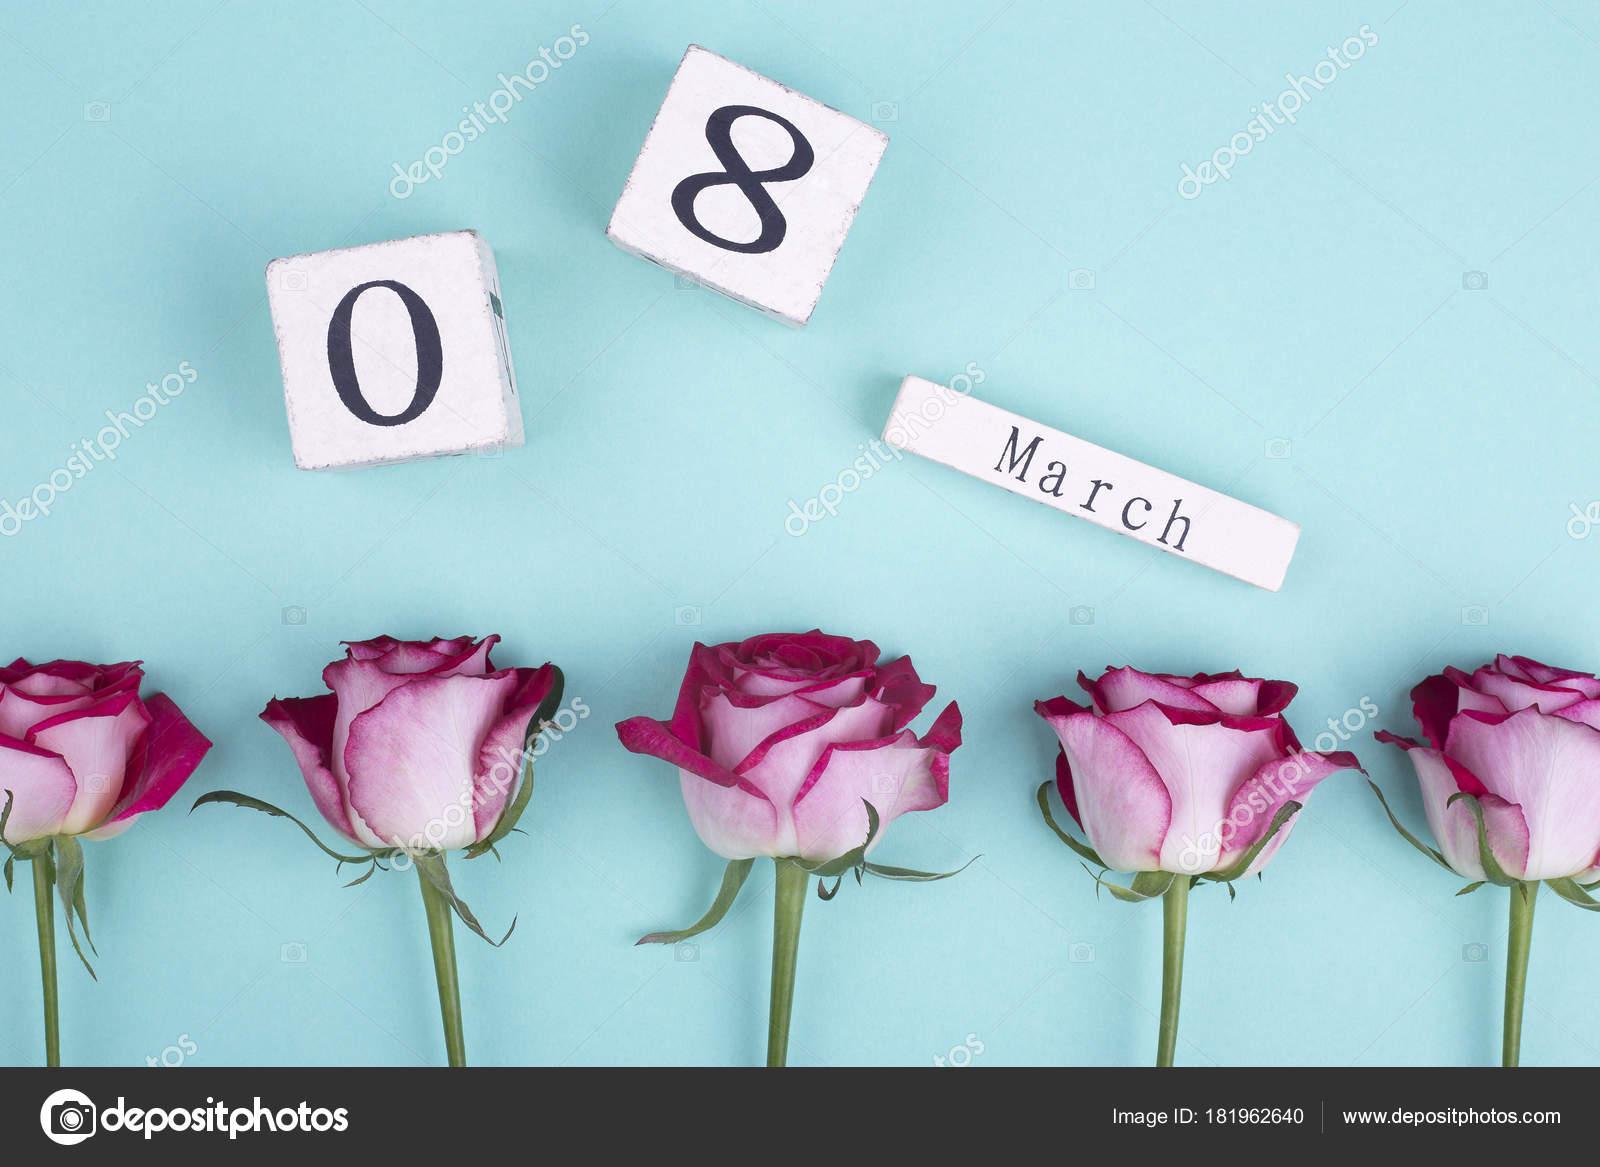 Calendario Ua.Rosas Y Calendario Antiguo De Madera Foto De Stock C Elenaruban Ua